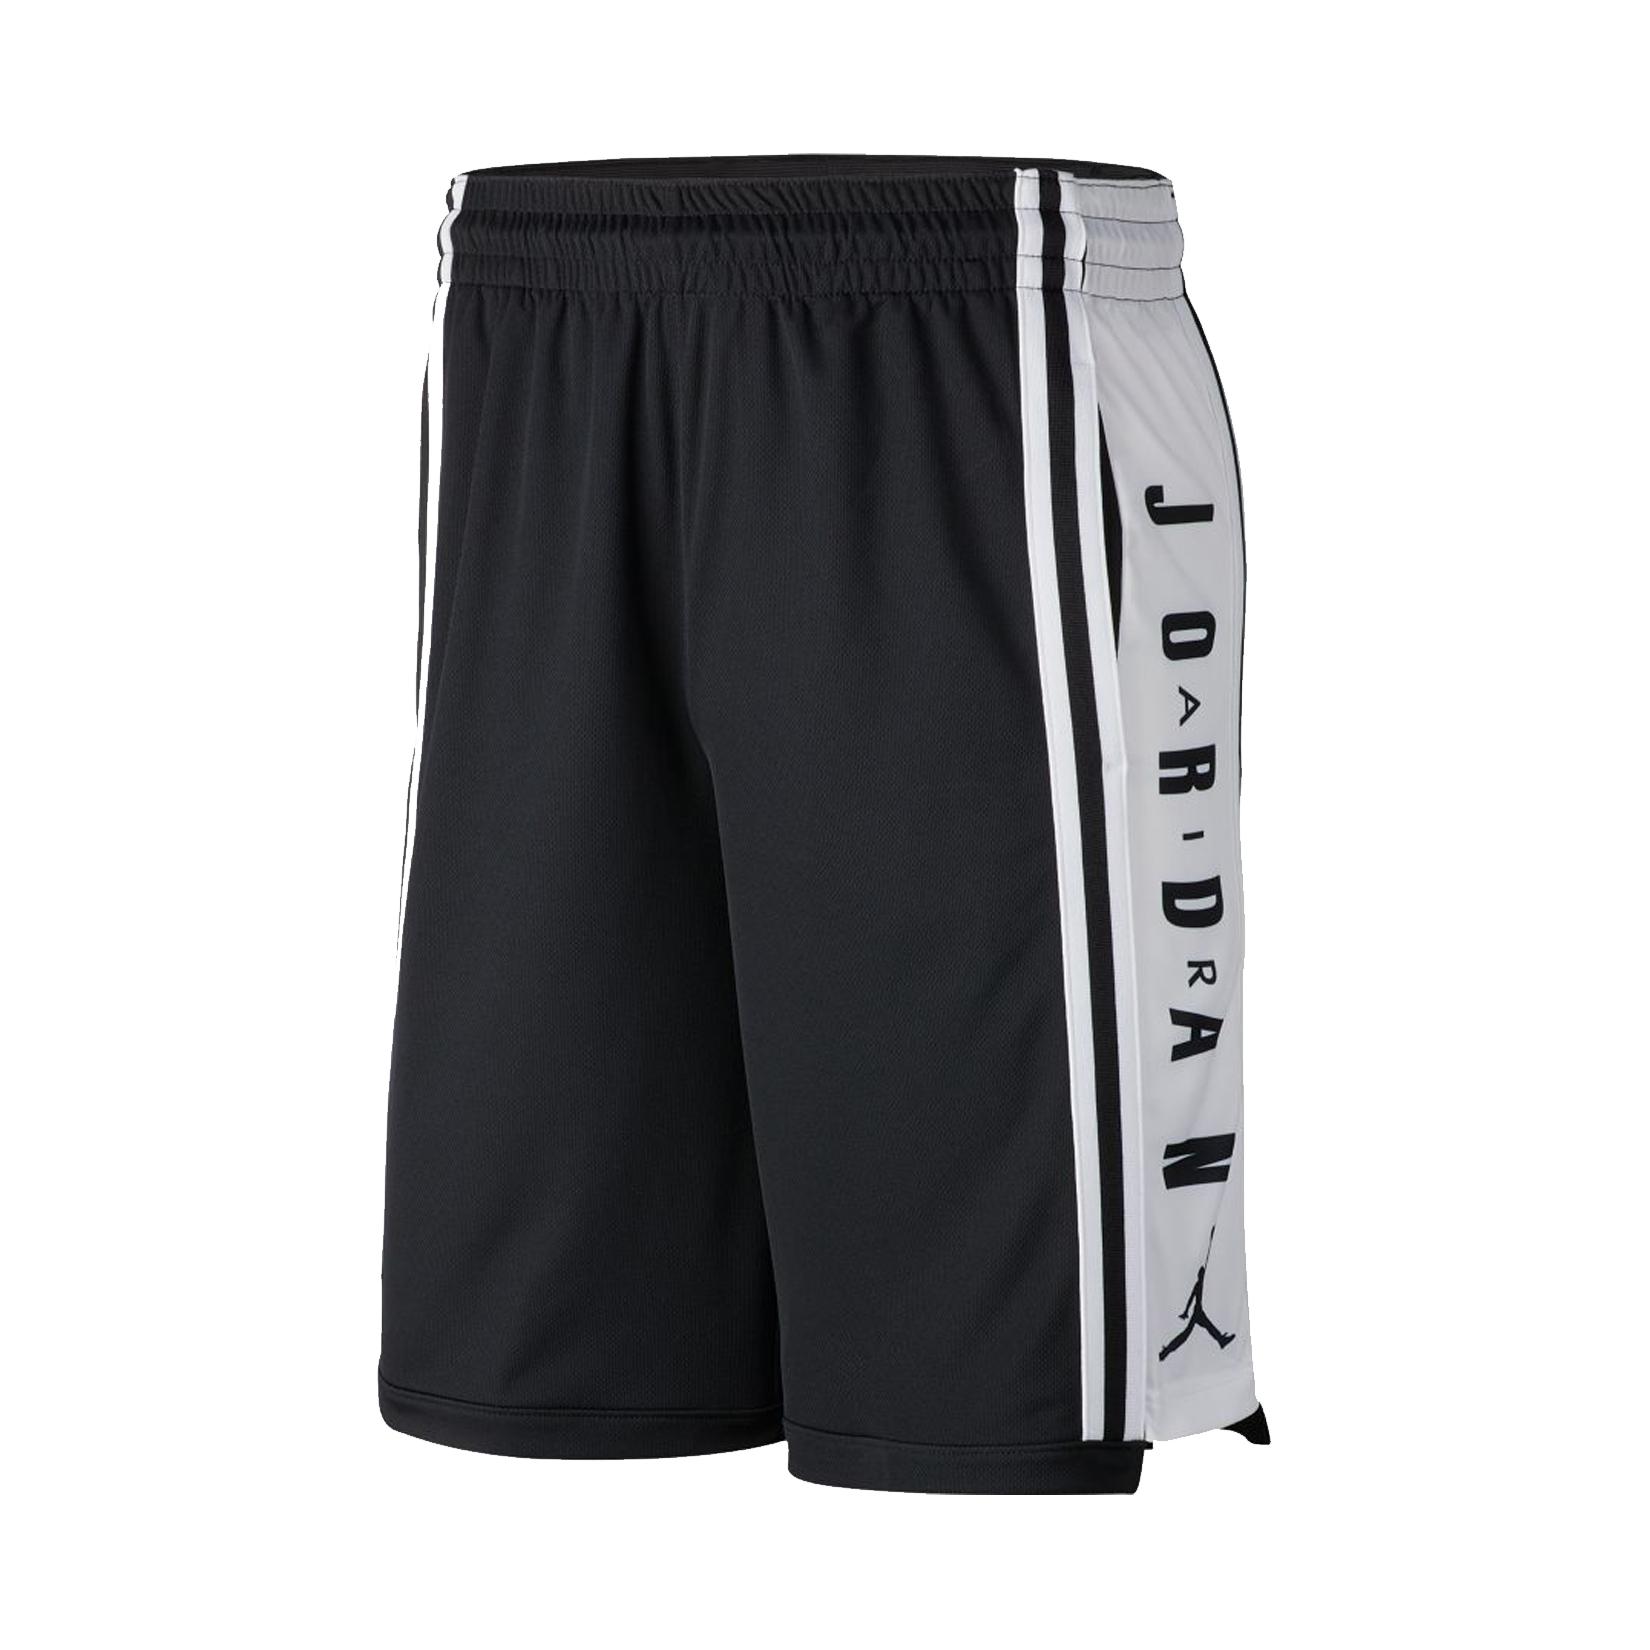 Jordan HBR Basketball Short Black